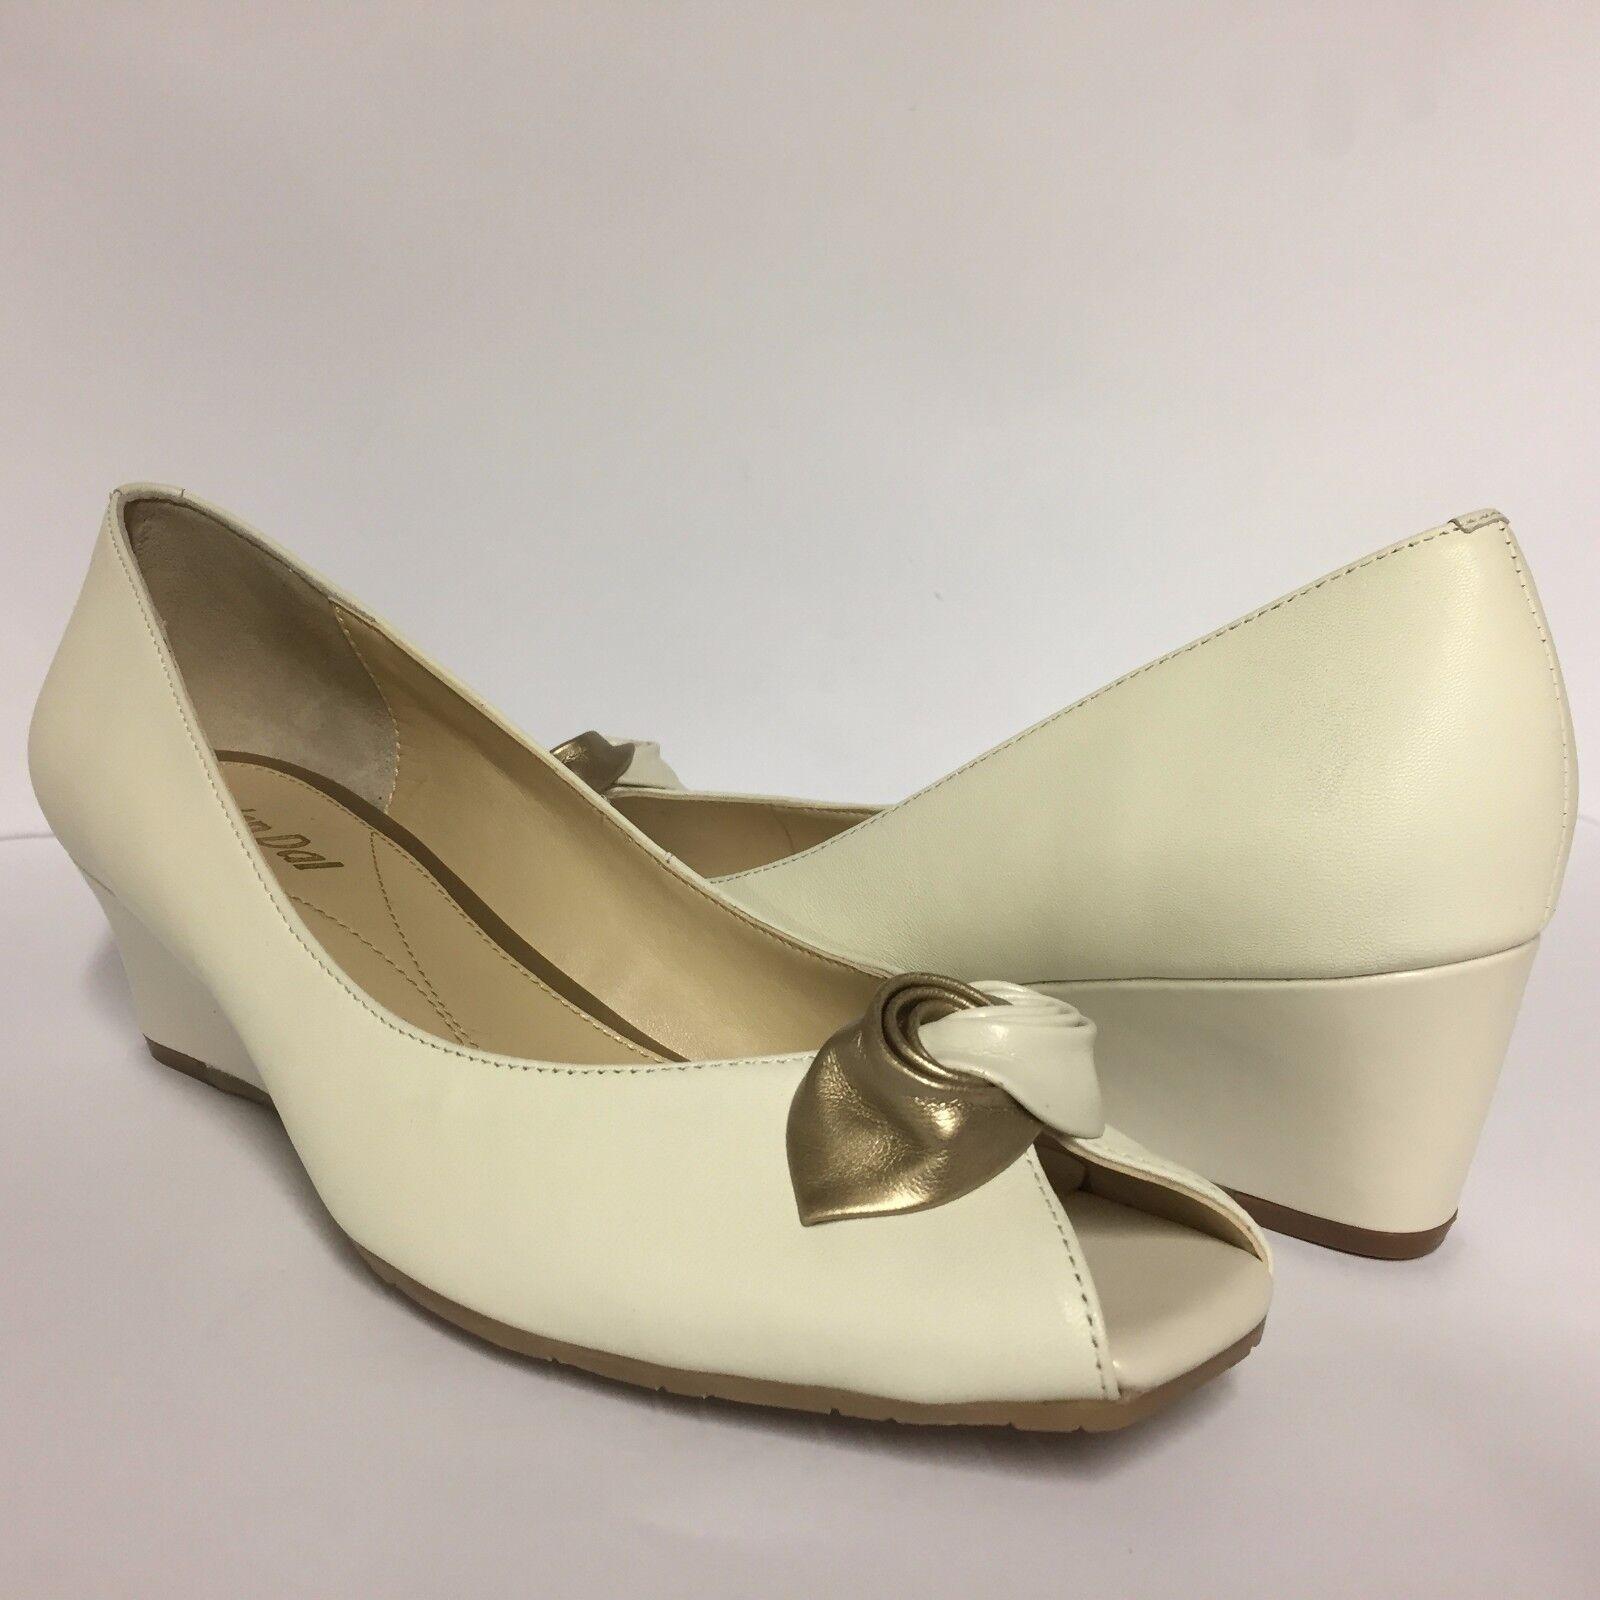 Van Dal Manila Off White white gold  Peep Toe Court shoes Wedge Heel